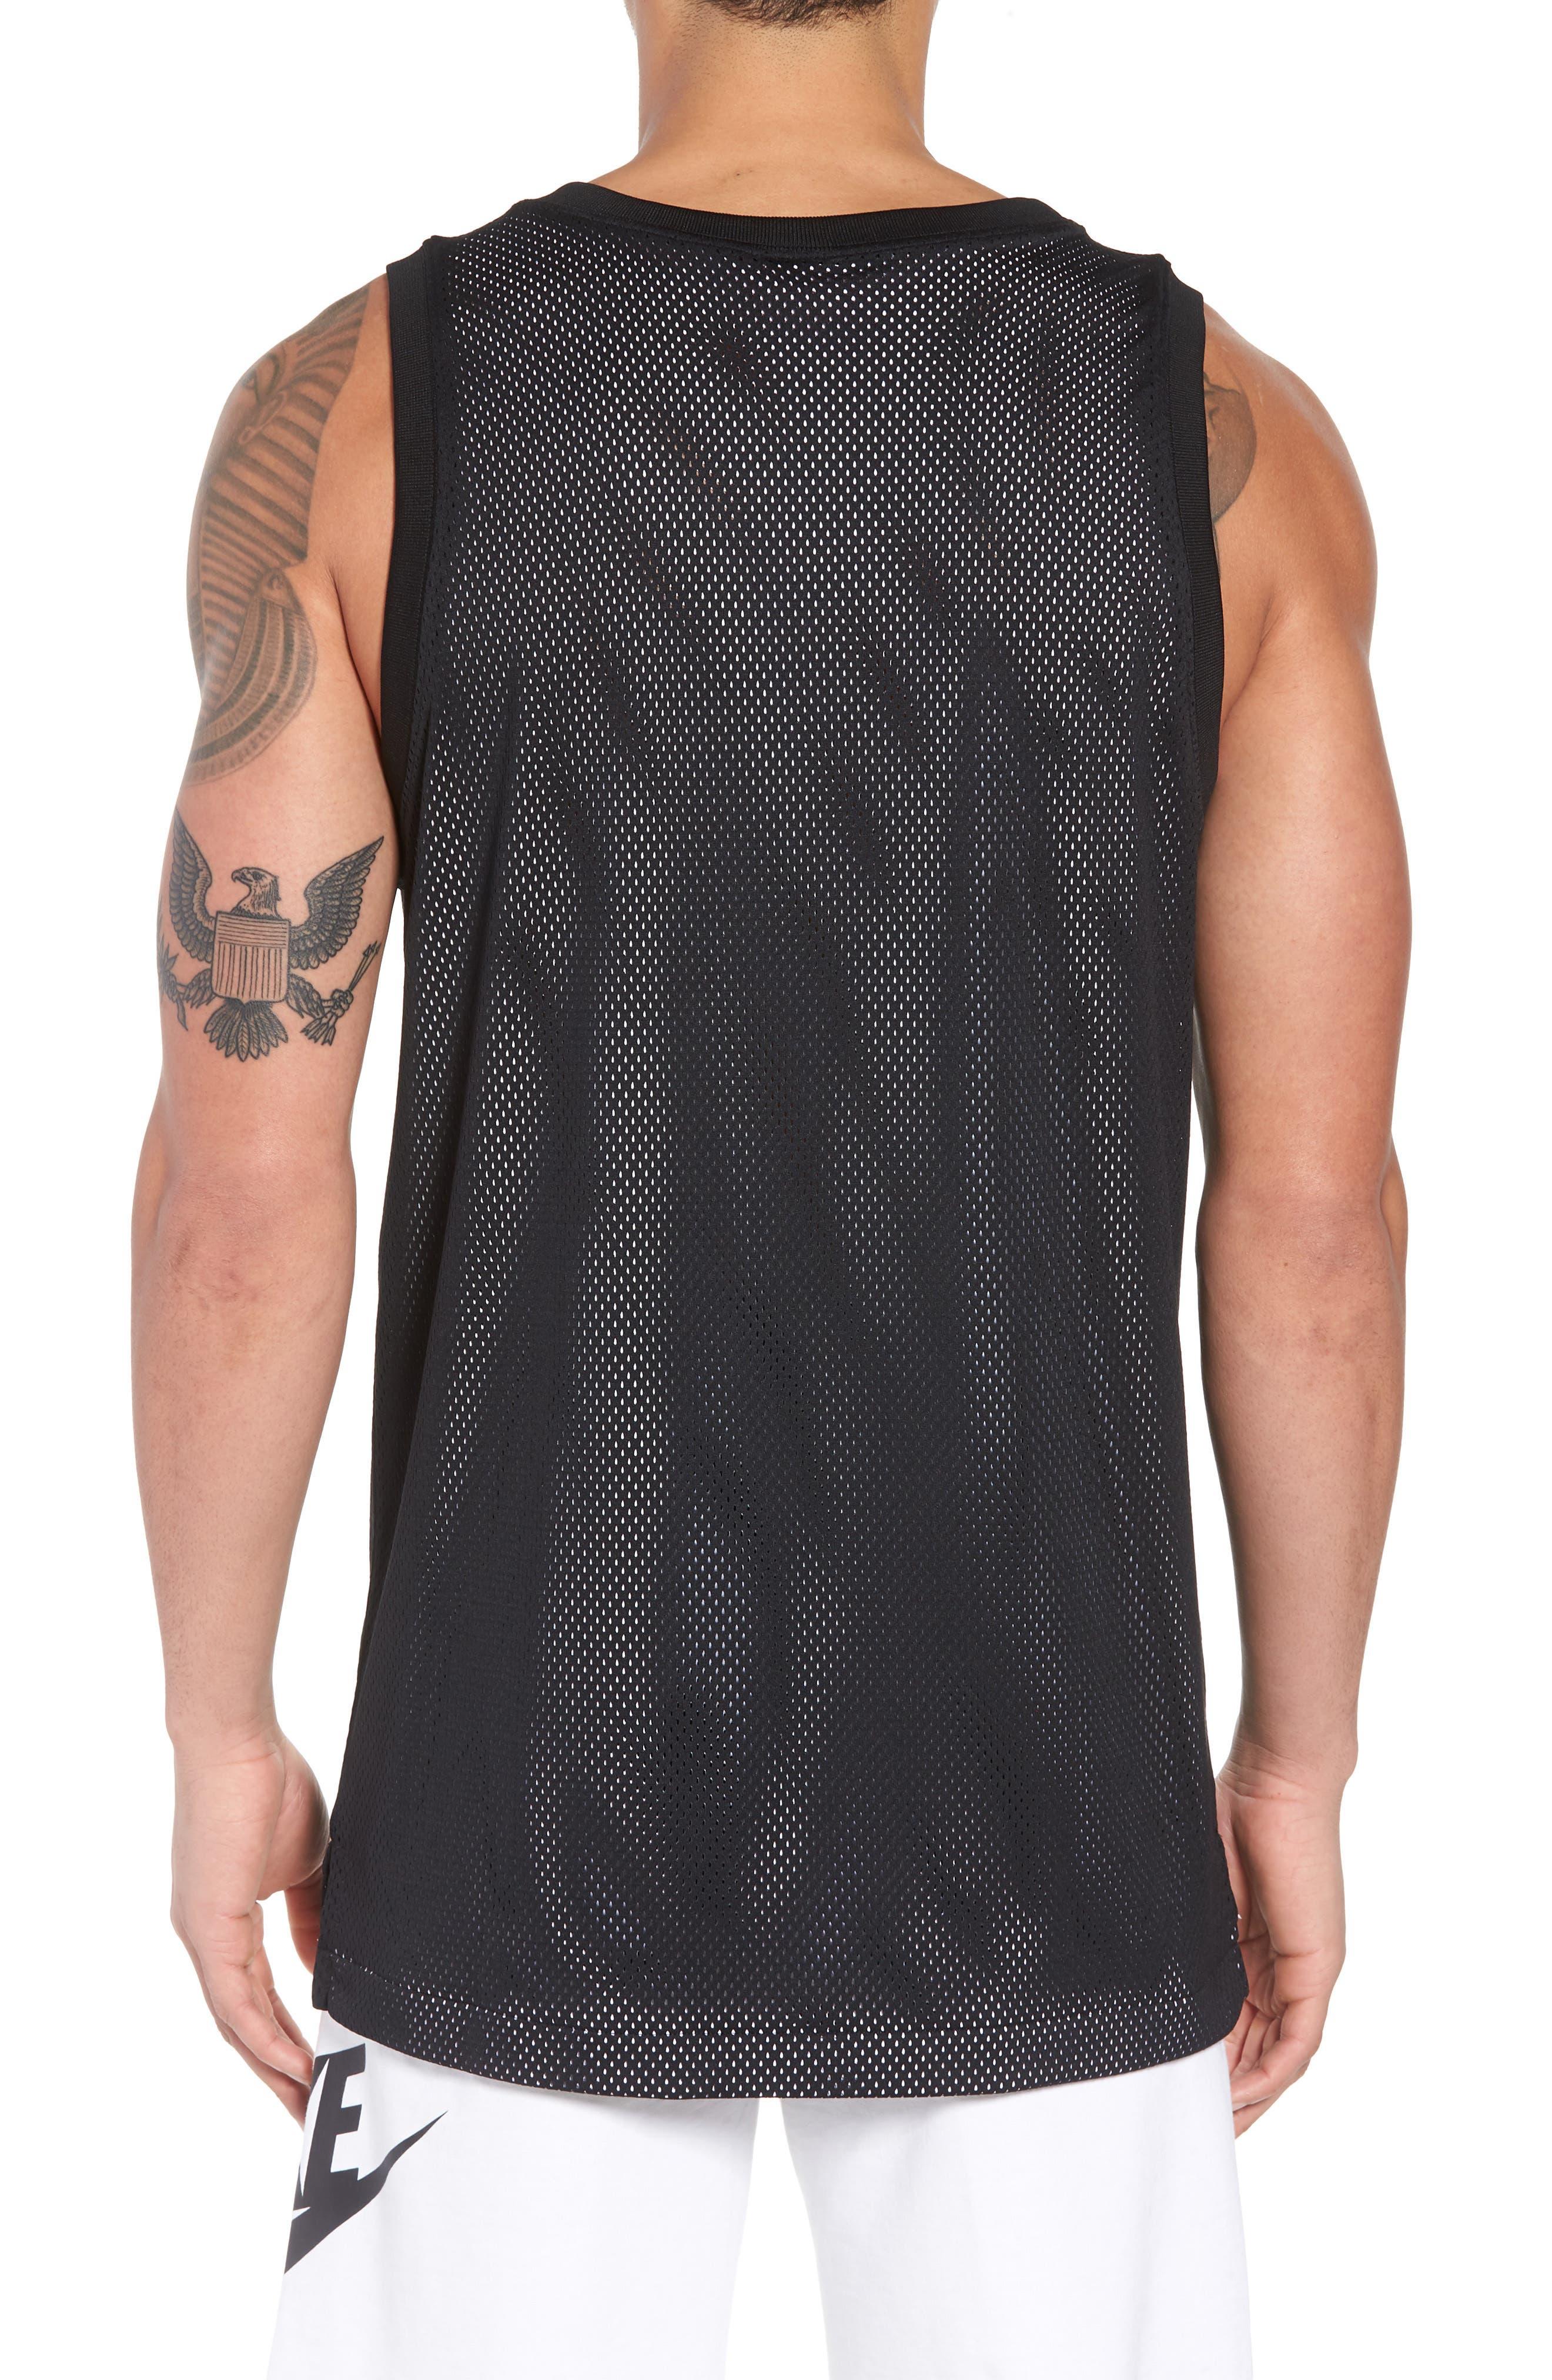 Sportswear Air Knit Tank,                             Alternate thumbnail 2, color,                             Black/ White